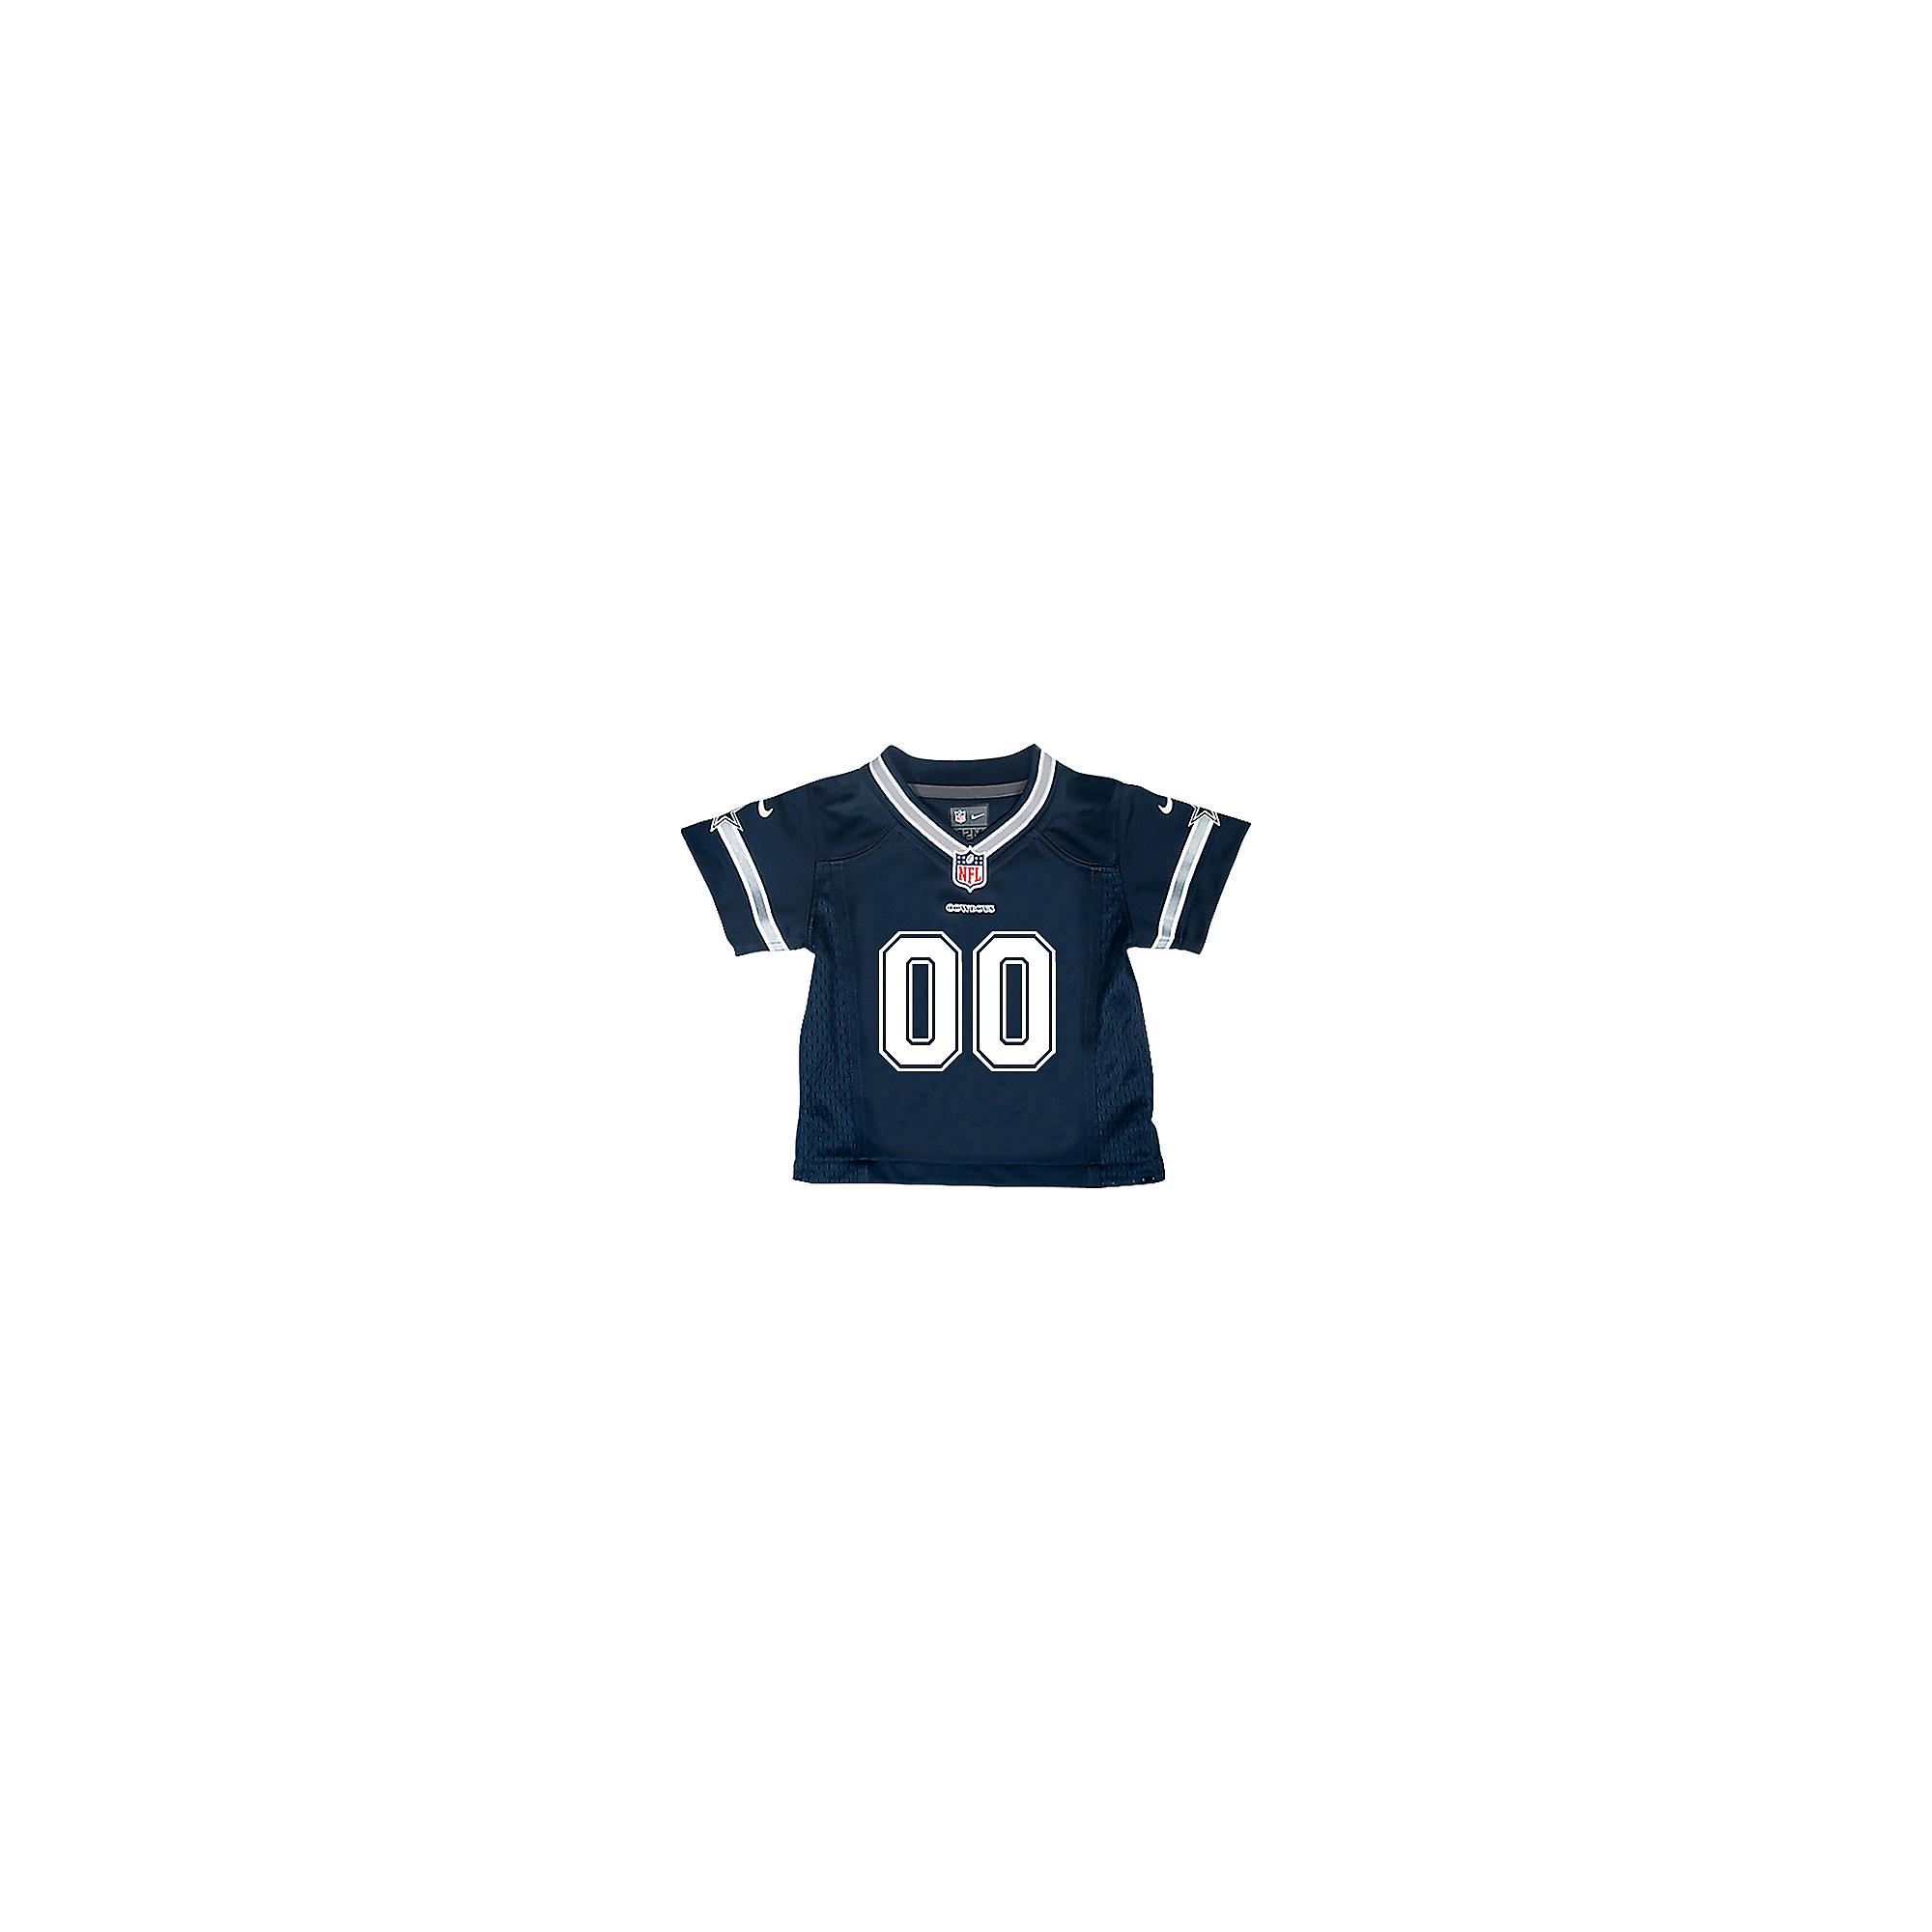 size 40 4843f 49f9d Dallas Cowboys Infant Custom Nike Navy Game Replica Jersey | Dallas Cowboys  Pro Shop